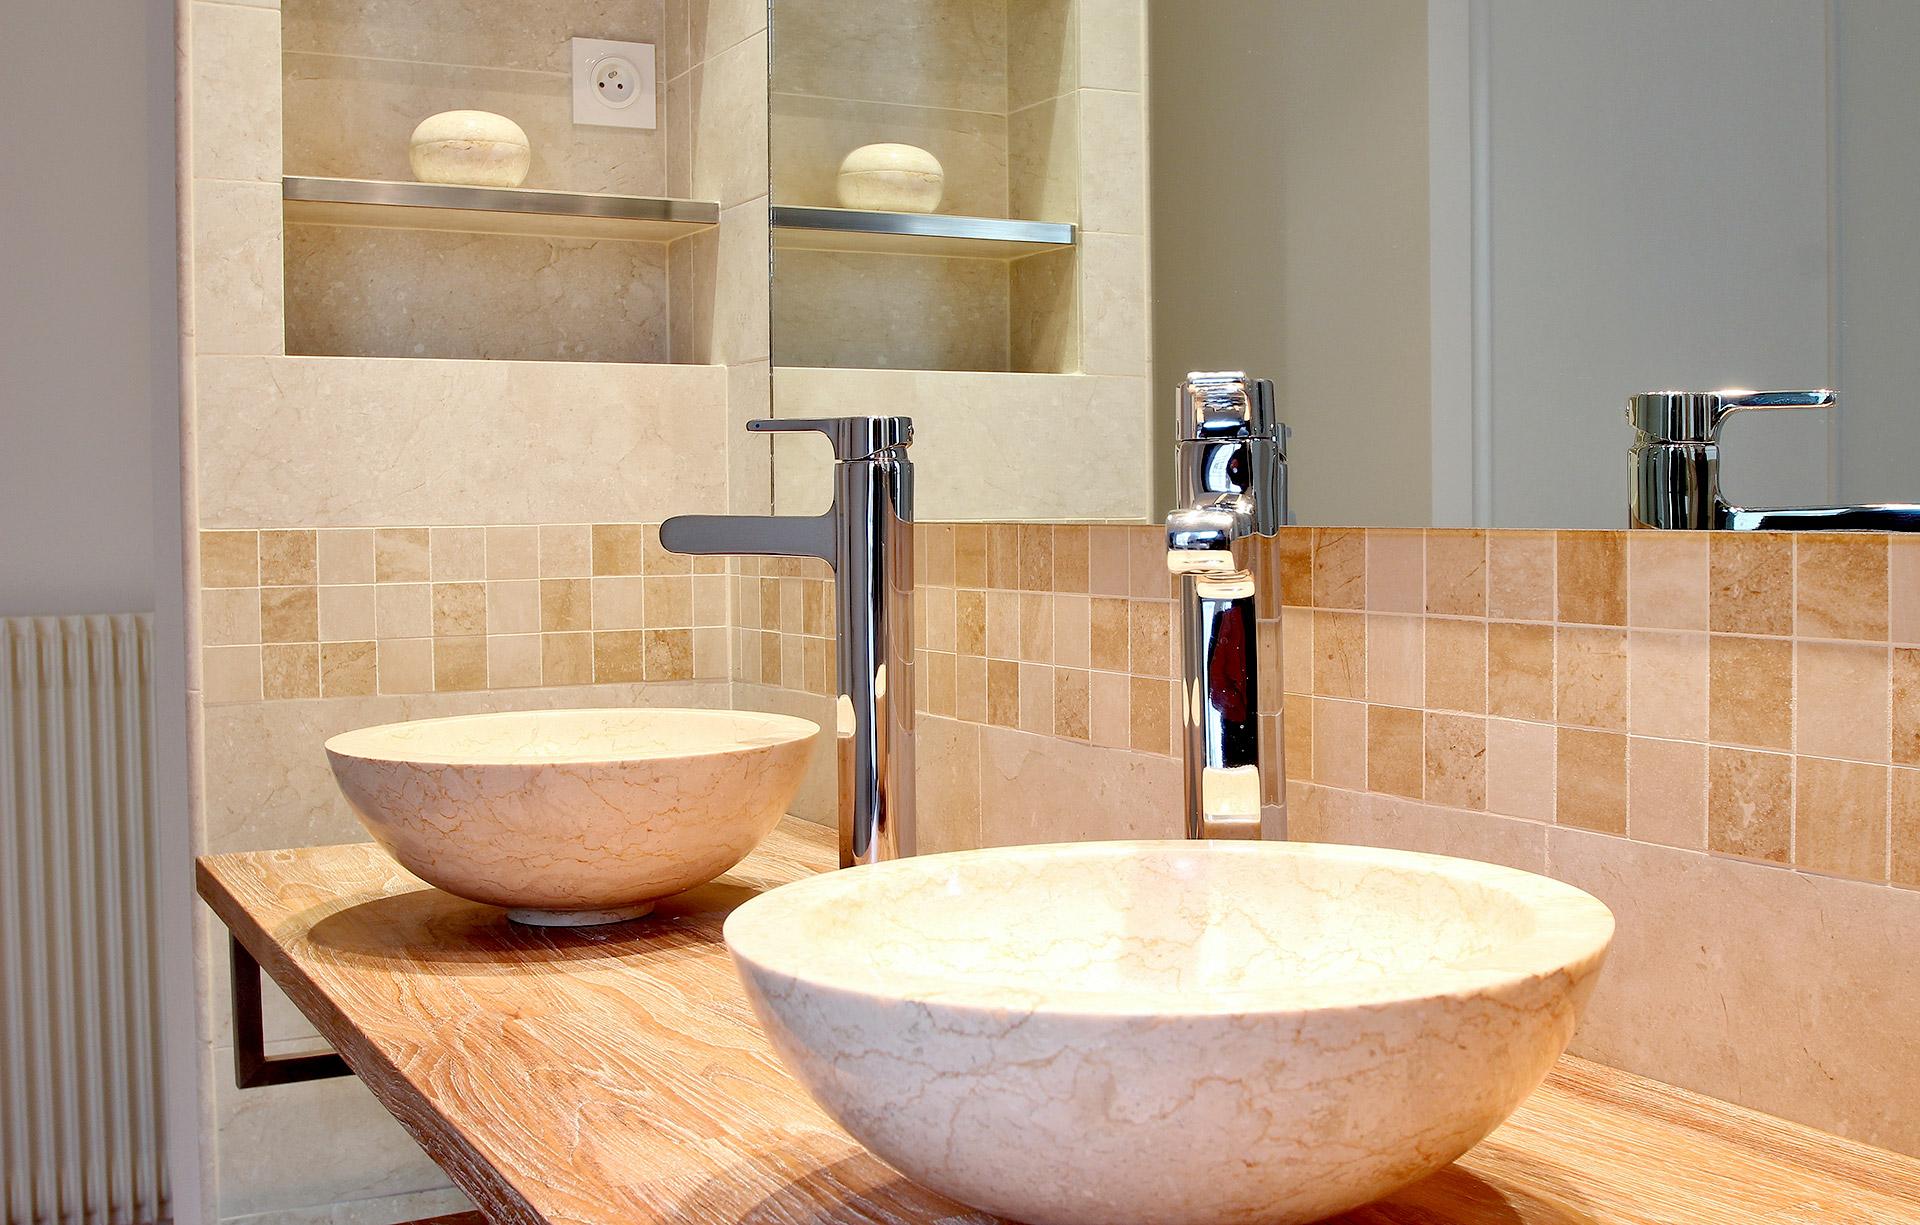 Salle de bain ouverte sur jardin for Salle de bain ouverte